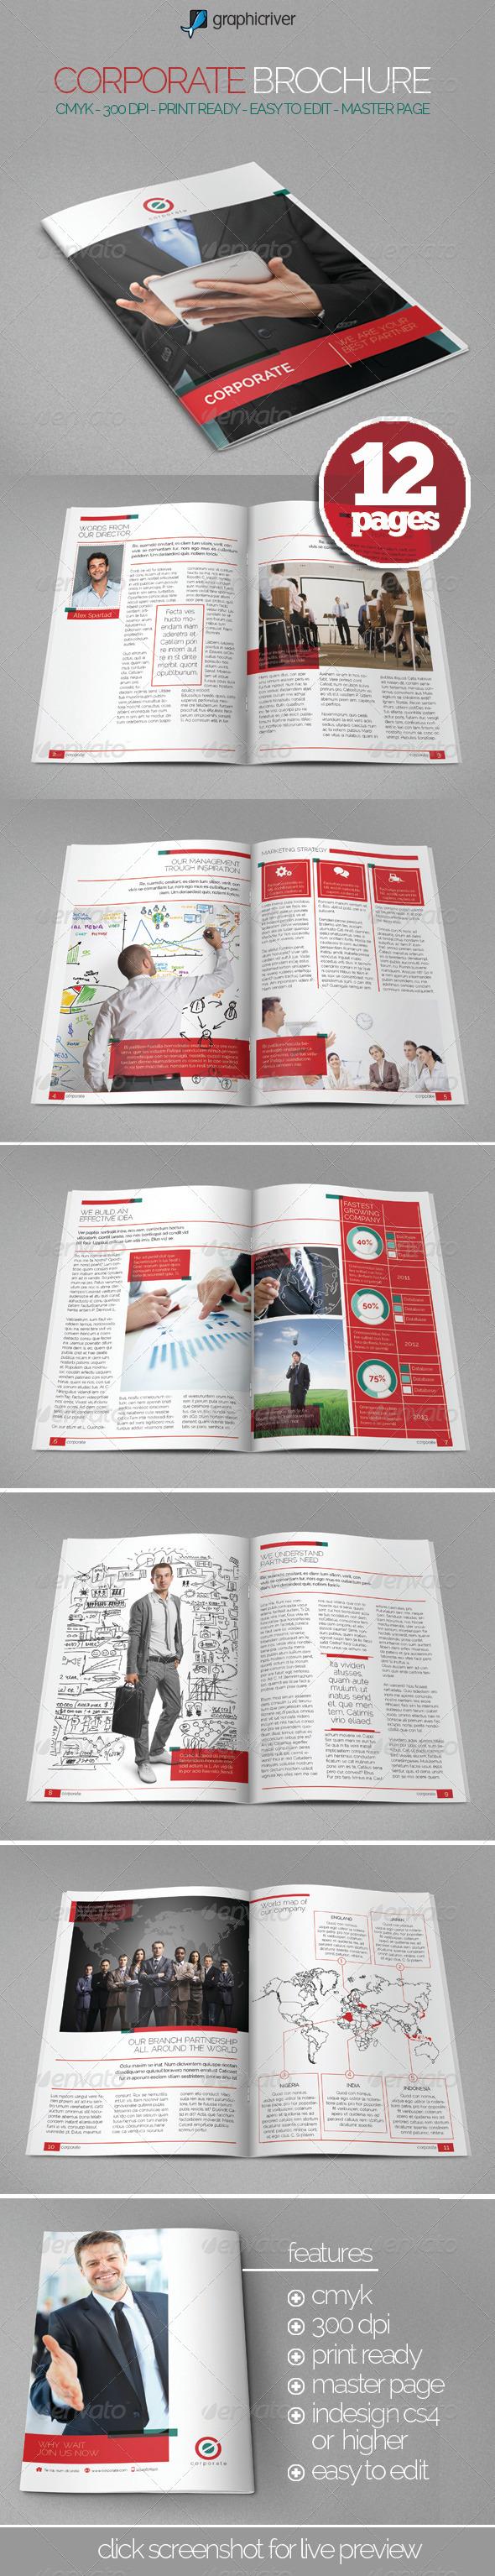 Easy Corporate Brochure - Brochures Print Templates